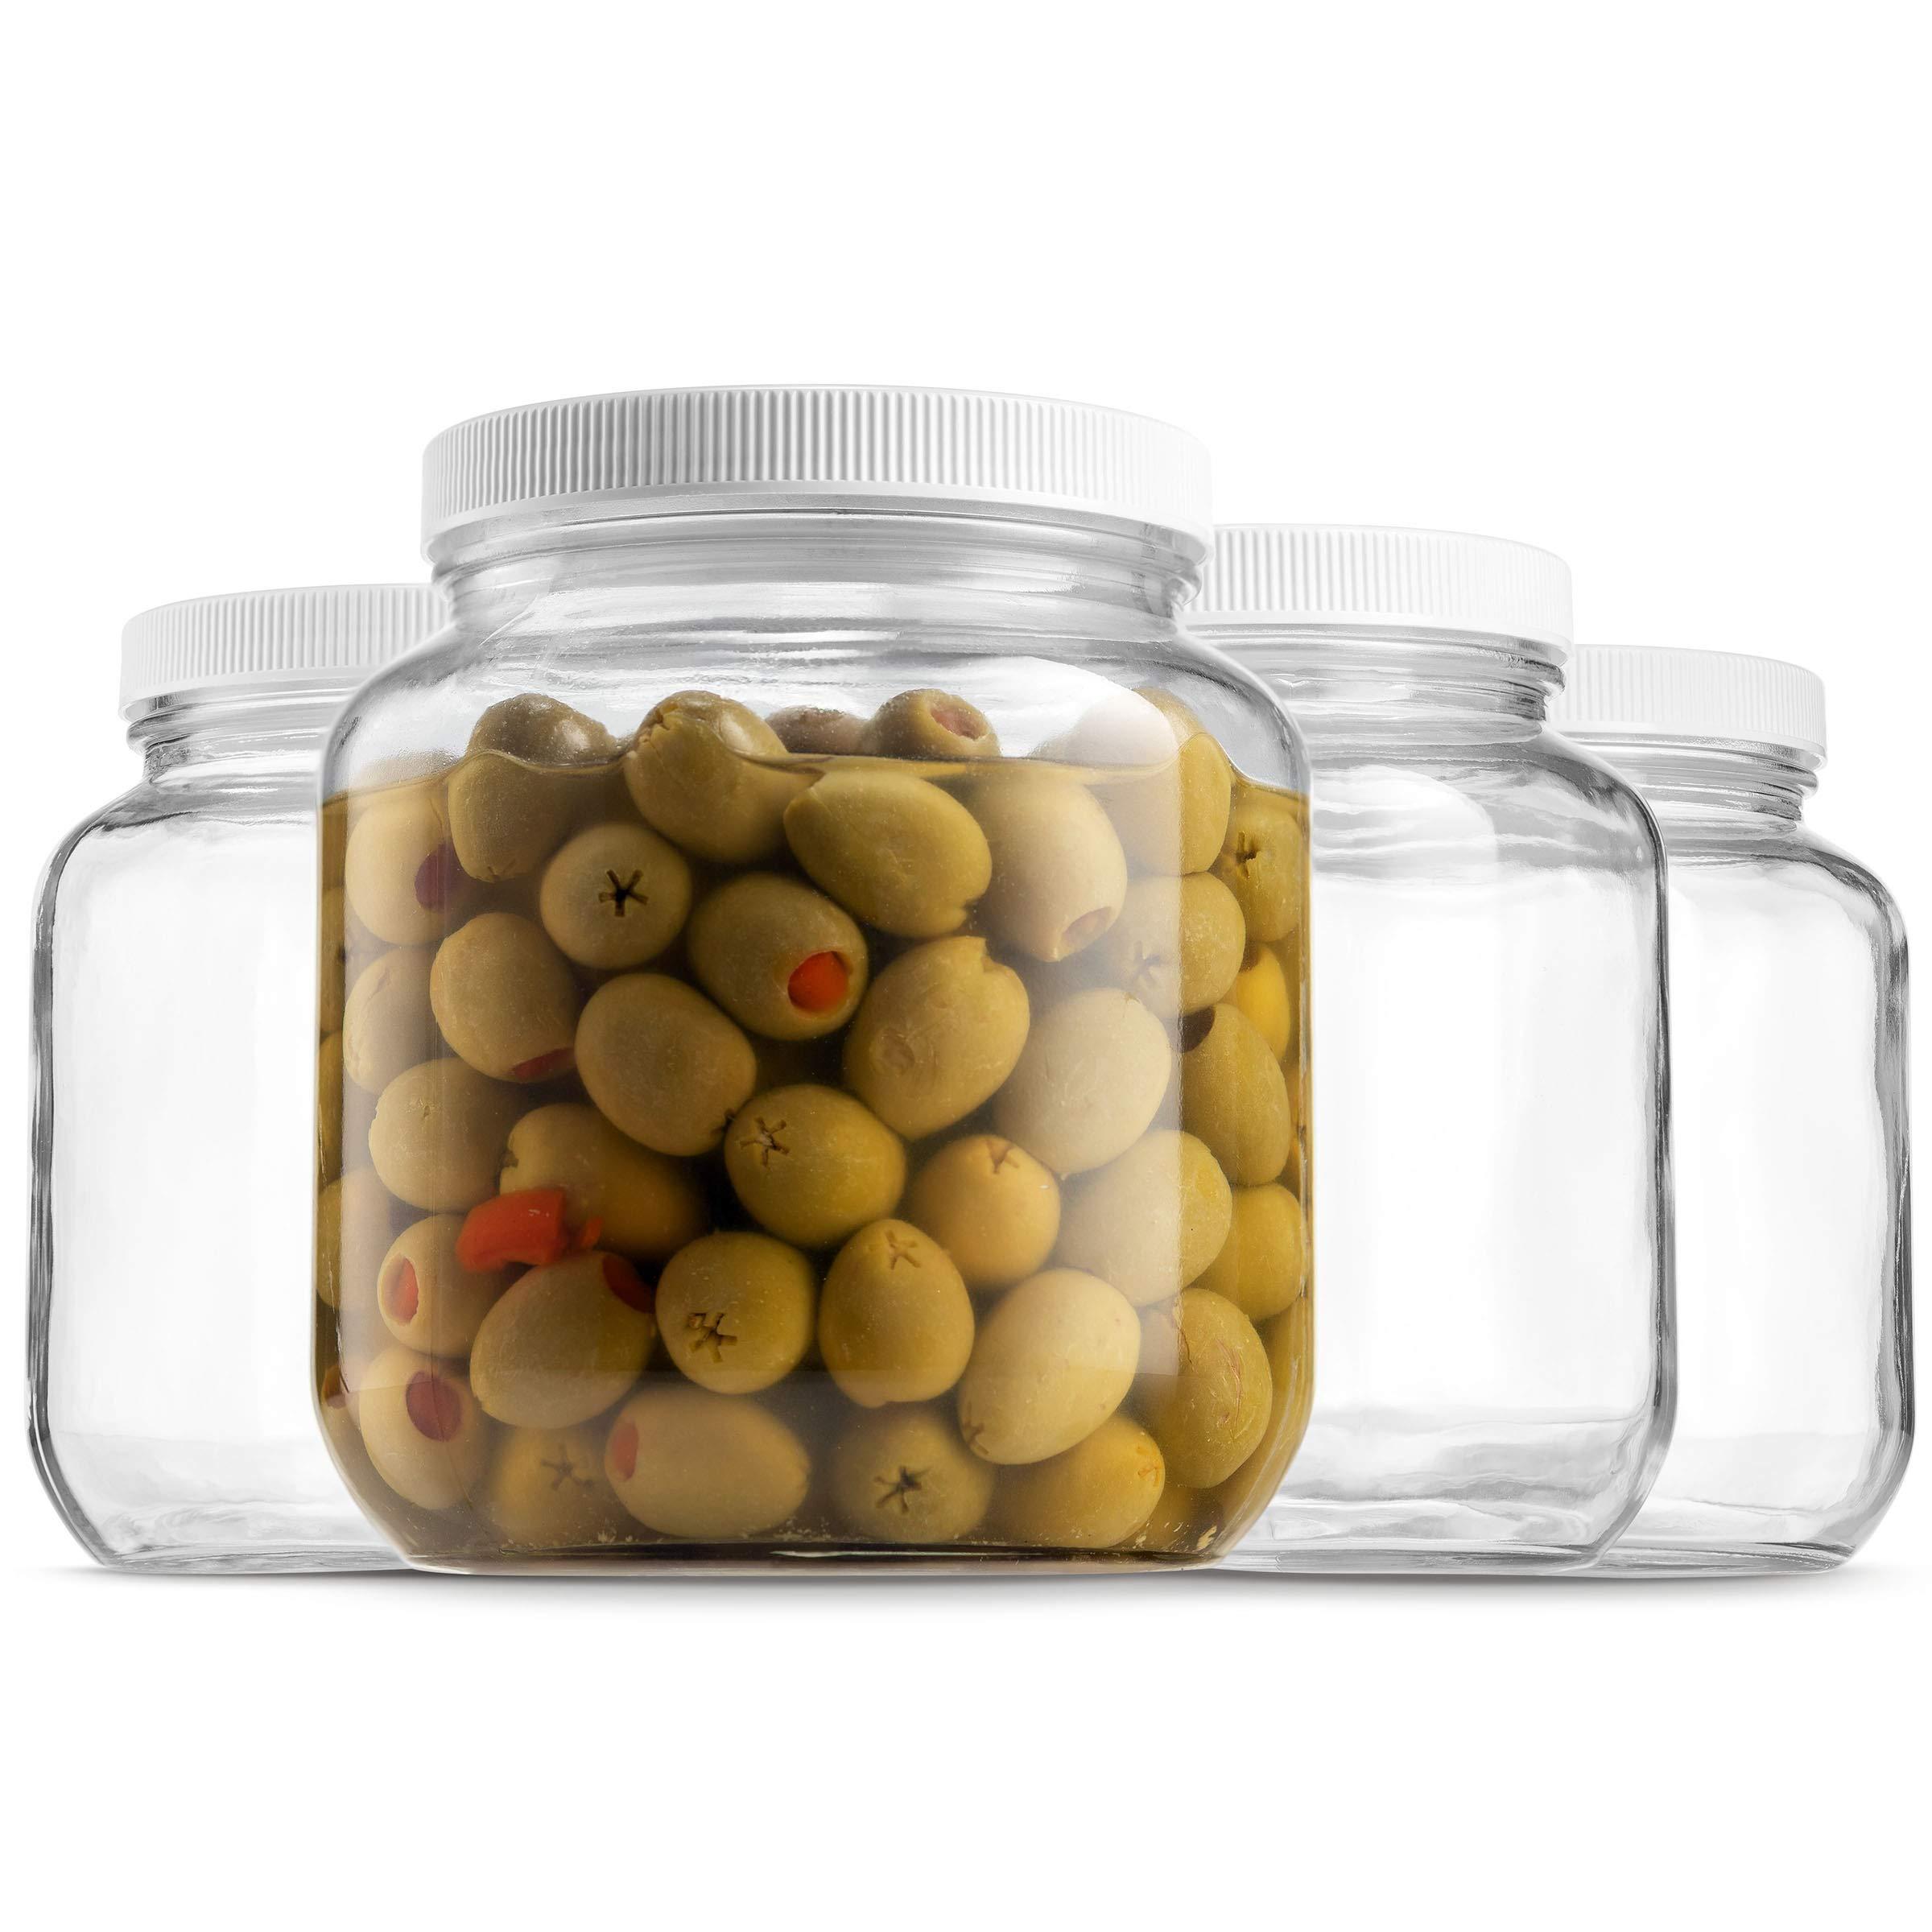 Half Gallon Glass Mason Jar (64 Oz - 2 Quart) - 4 Pack - Wide Mouth, Plastic Airtight Lid, USDA Approved BPA-Free Dishwasher Safe Canning Jar for Fermenting, Sun Tea, Kombucha, Dry Food Storage, Clear by Paksh Novelty